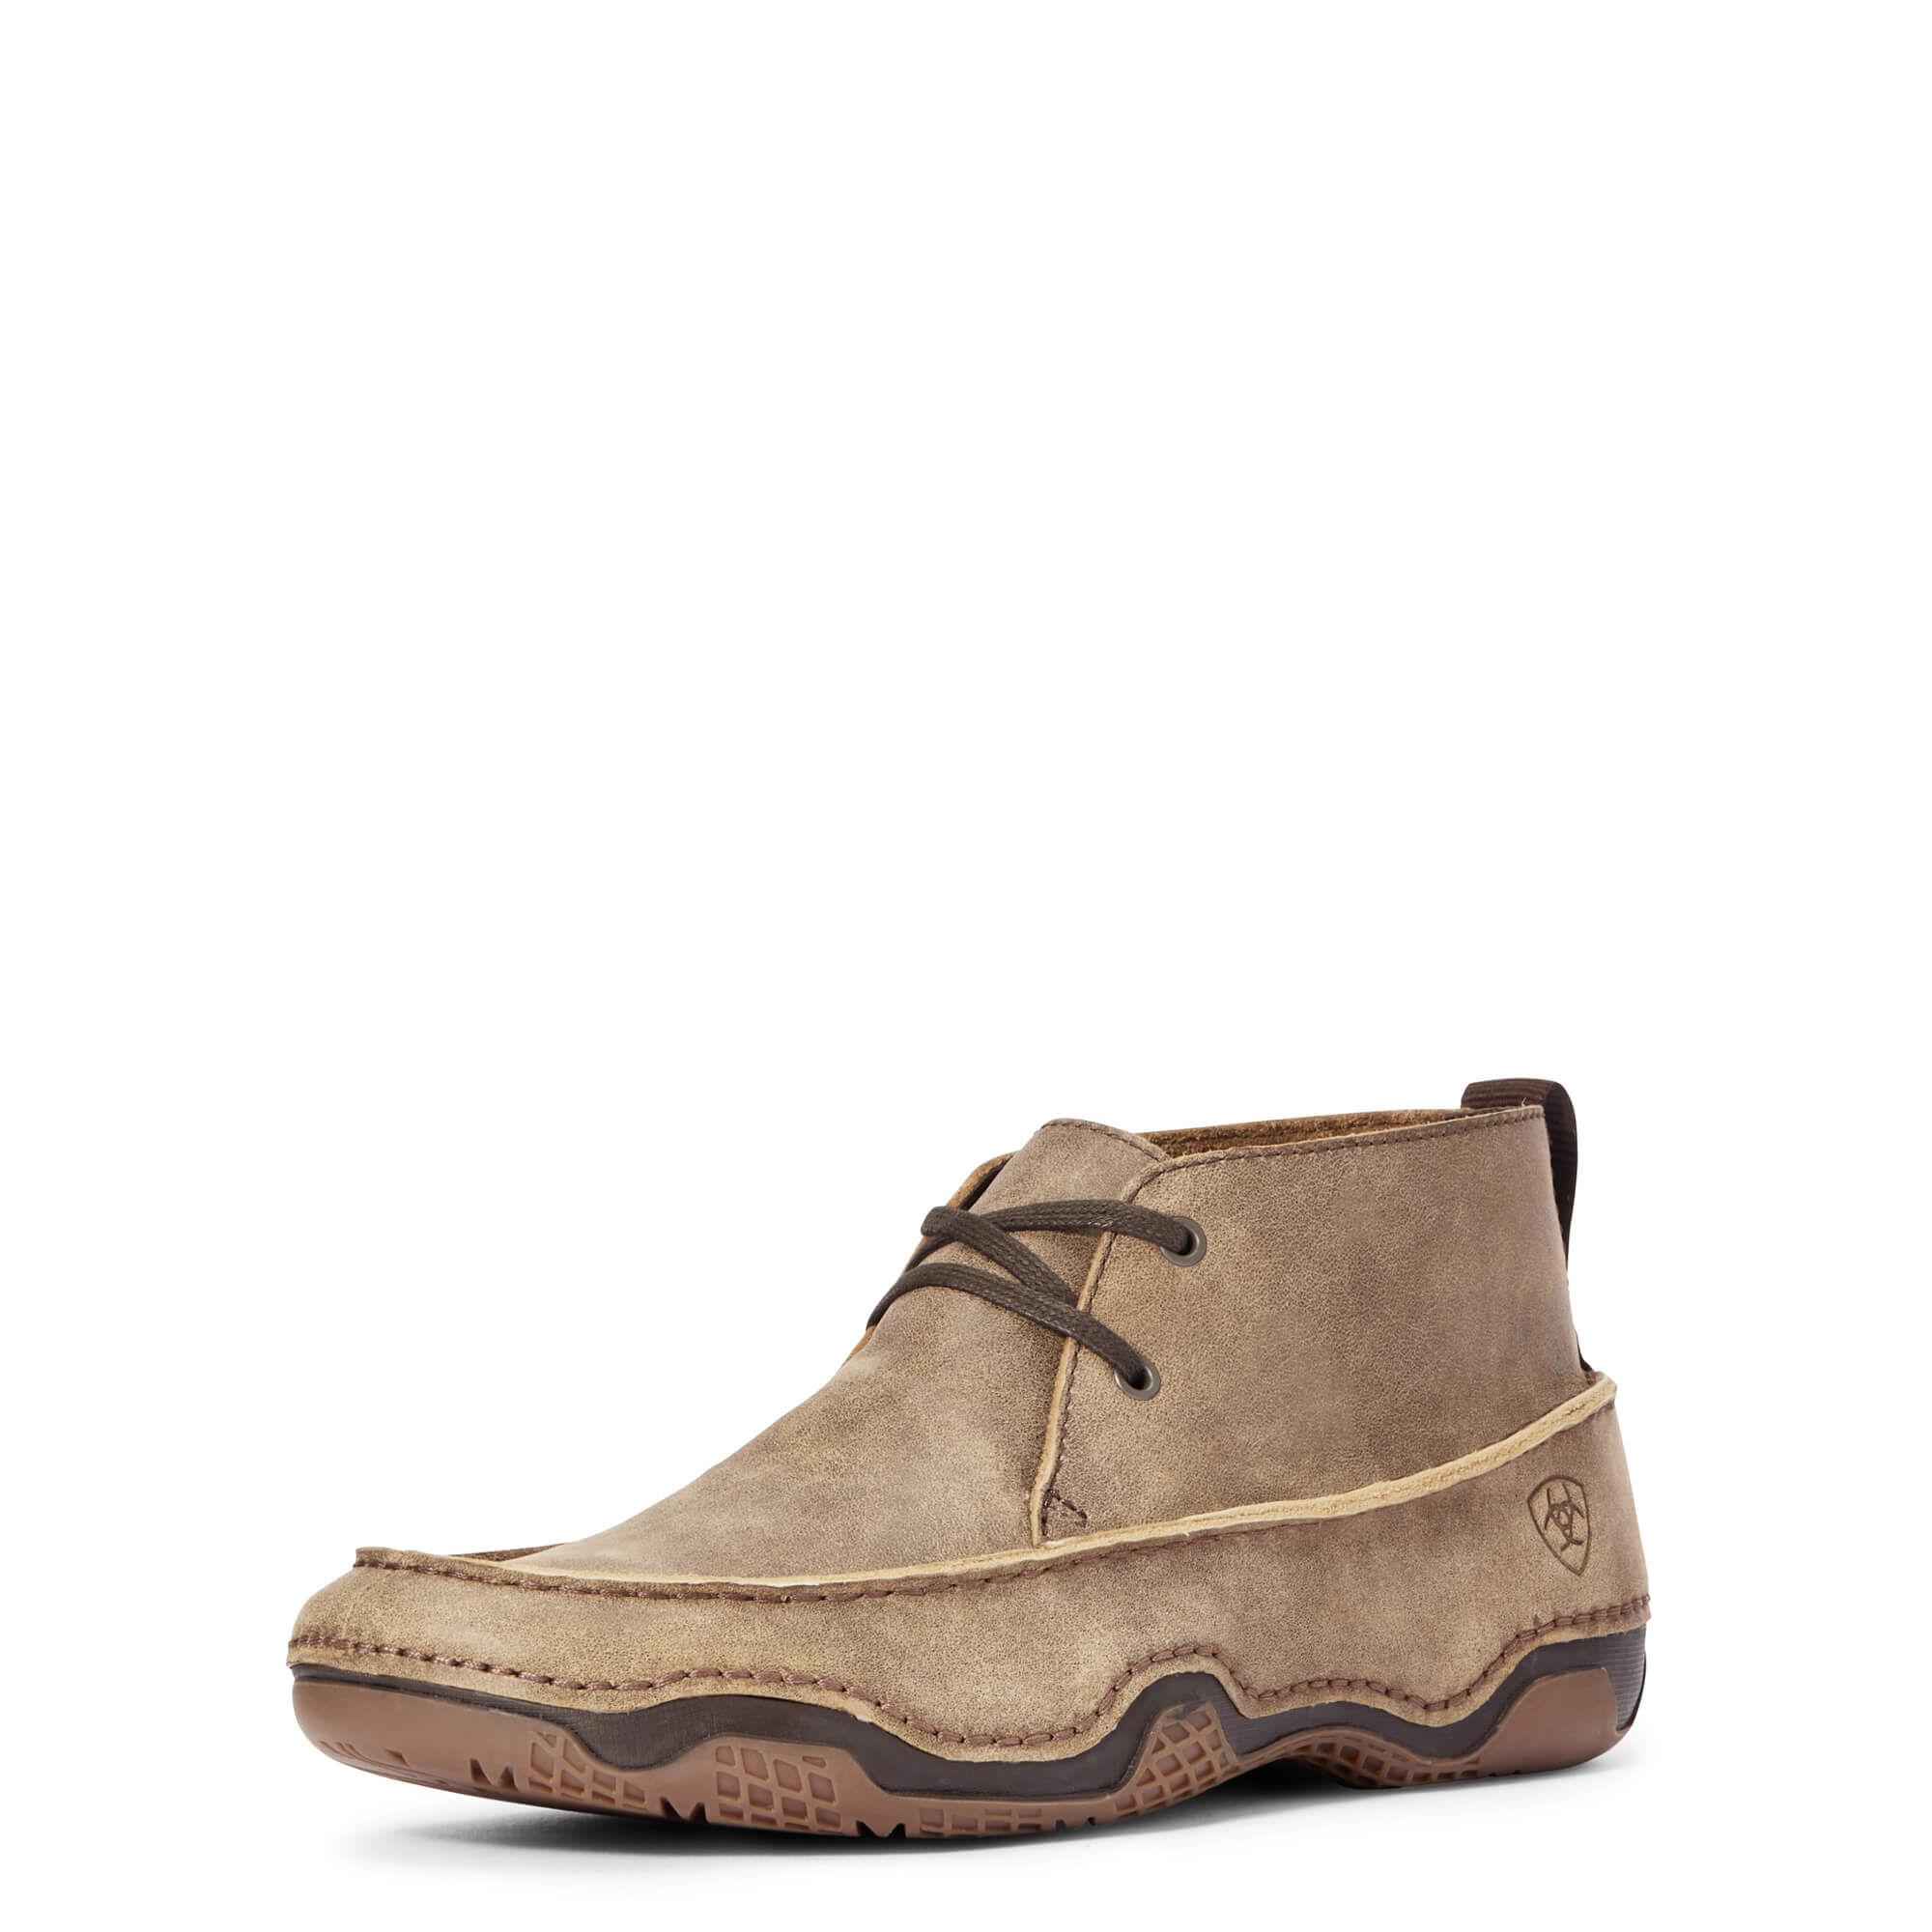 Ariat Mens Shoes - Men's Casual